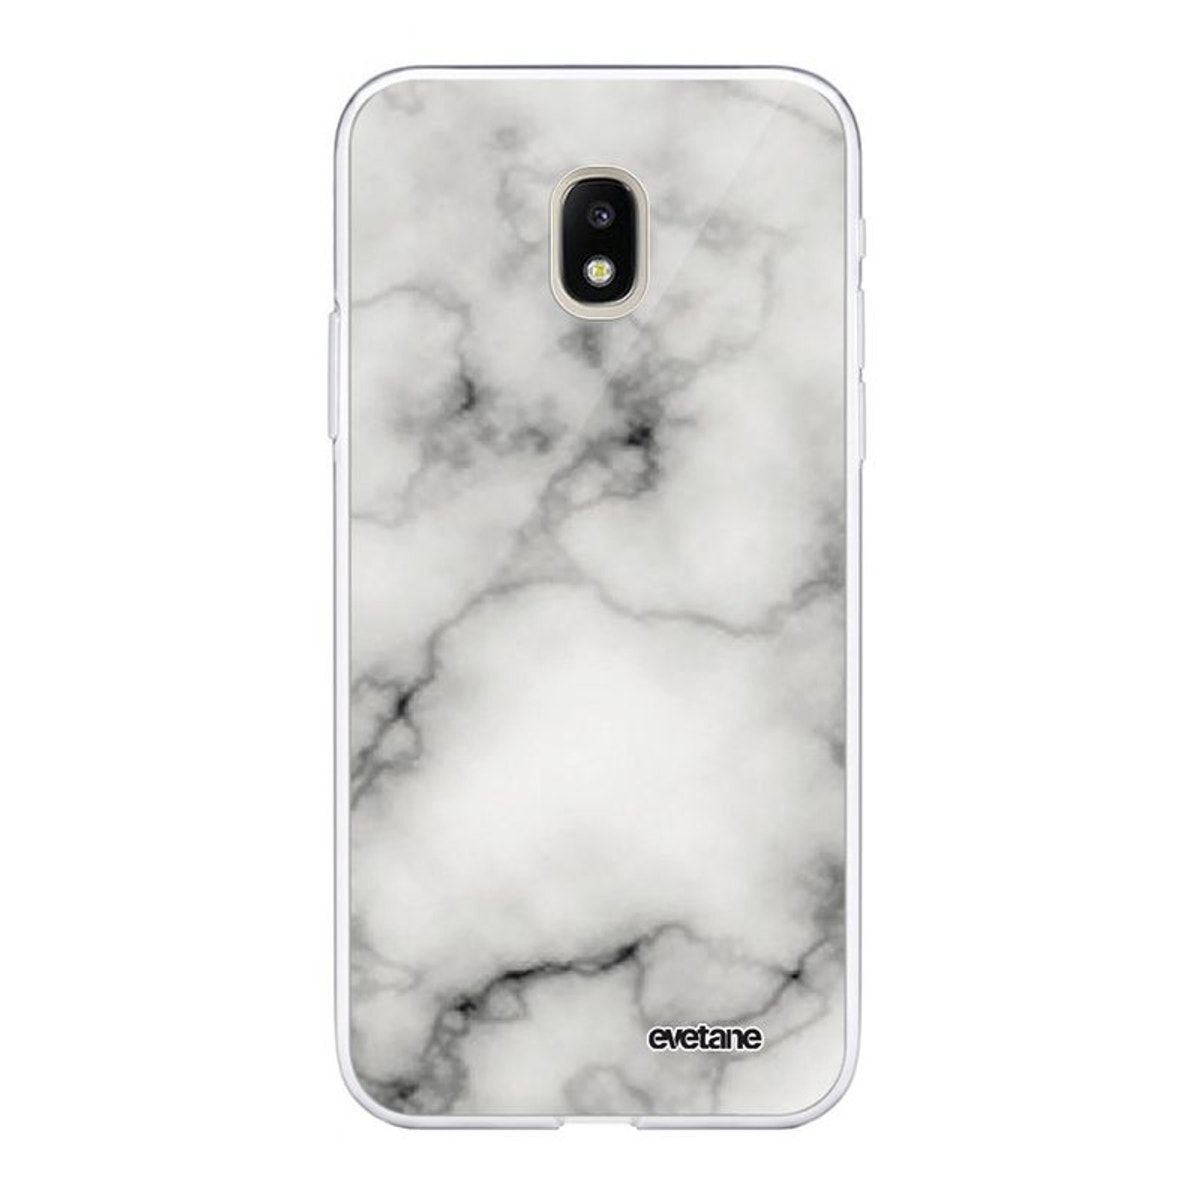 Coque Samsung Galaxy J3 2017 avant arrière transparente   Phone ...